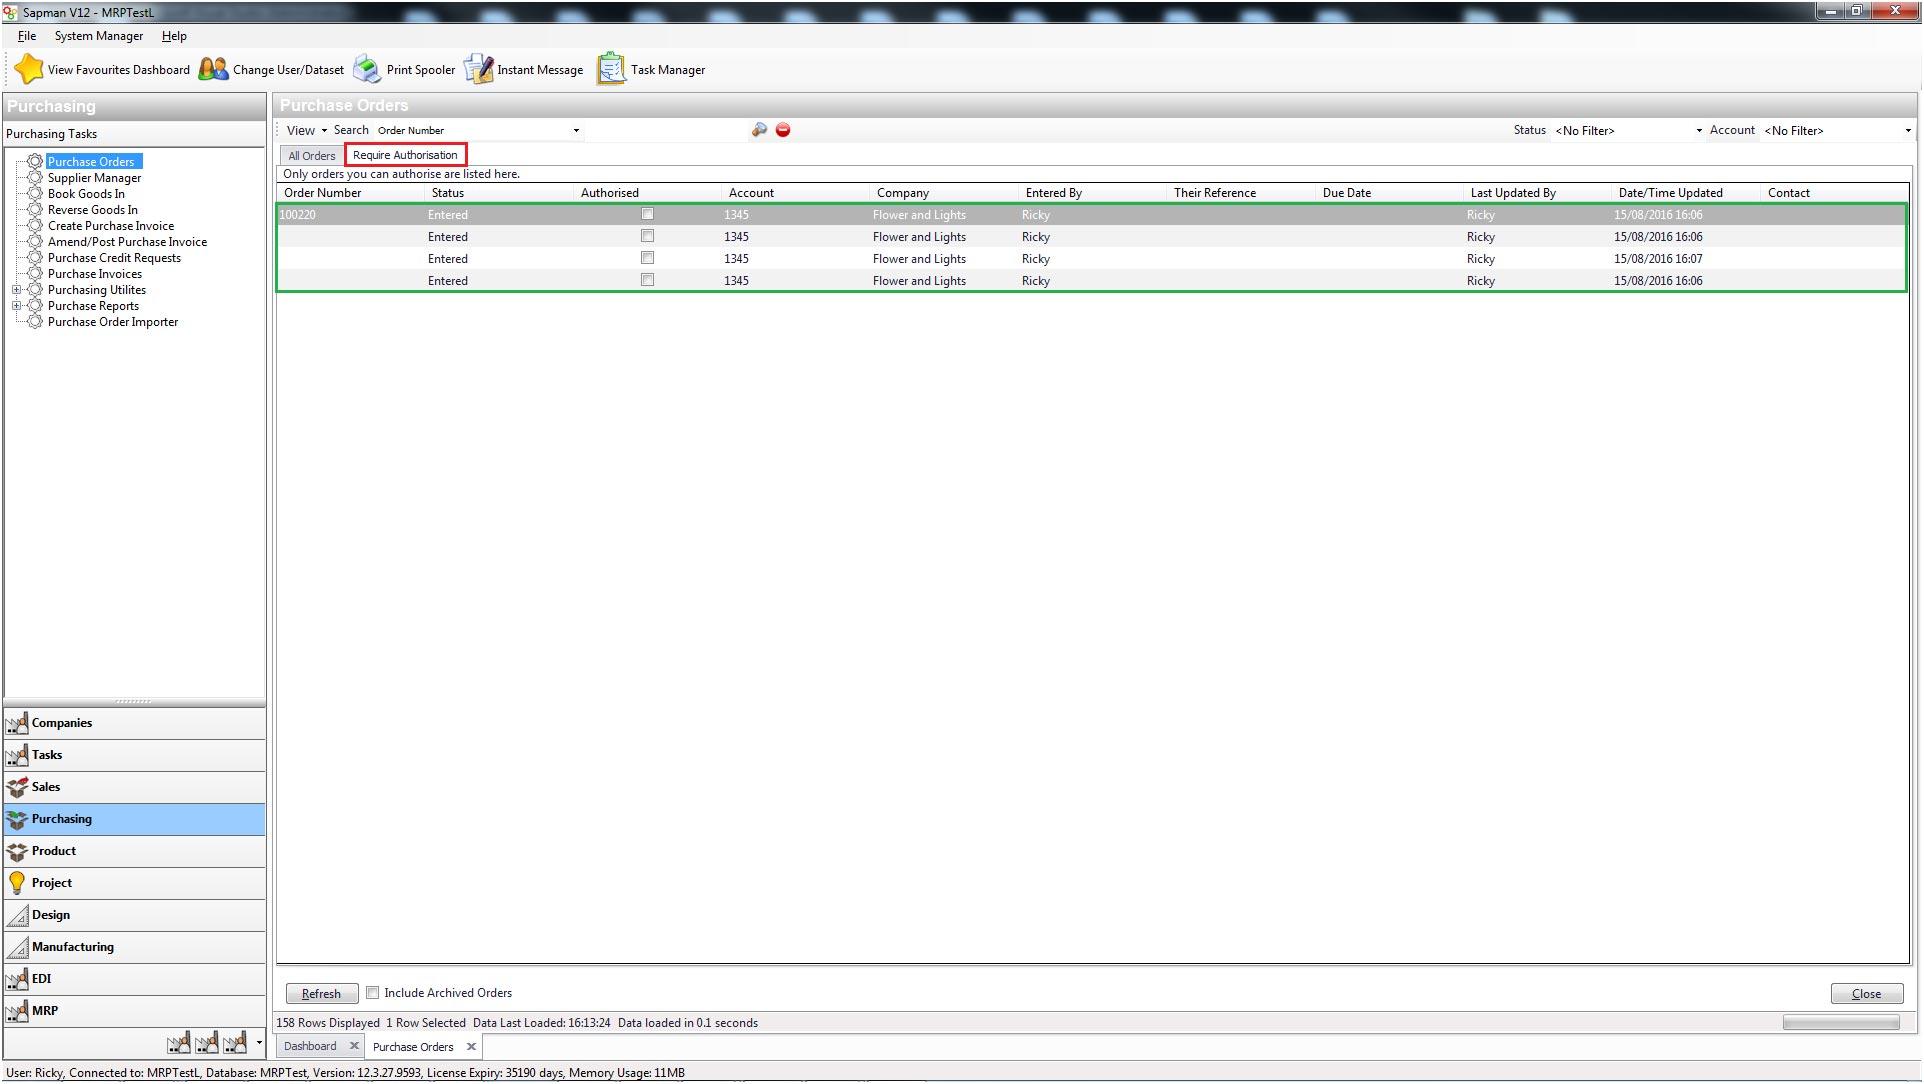 Sapman v12 Purchase Order Authorisation screen